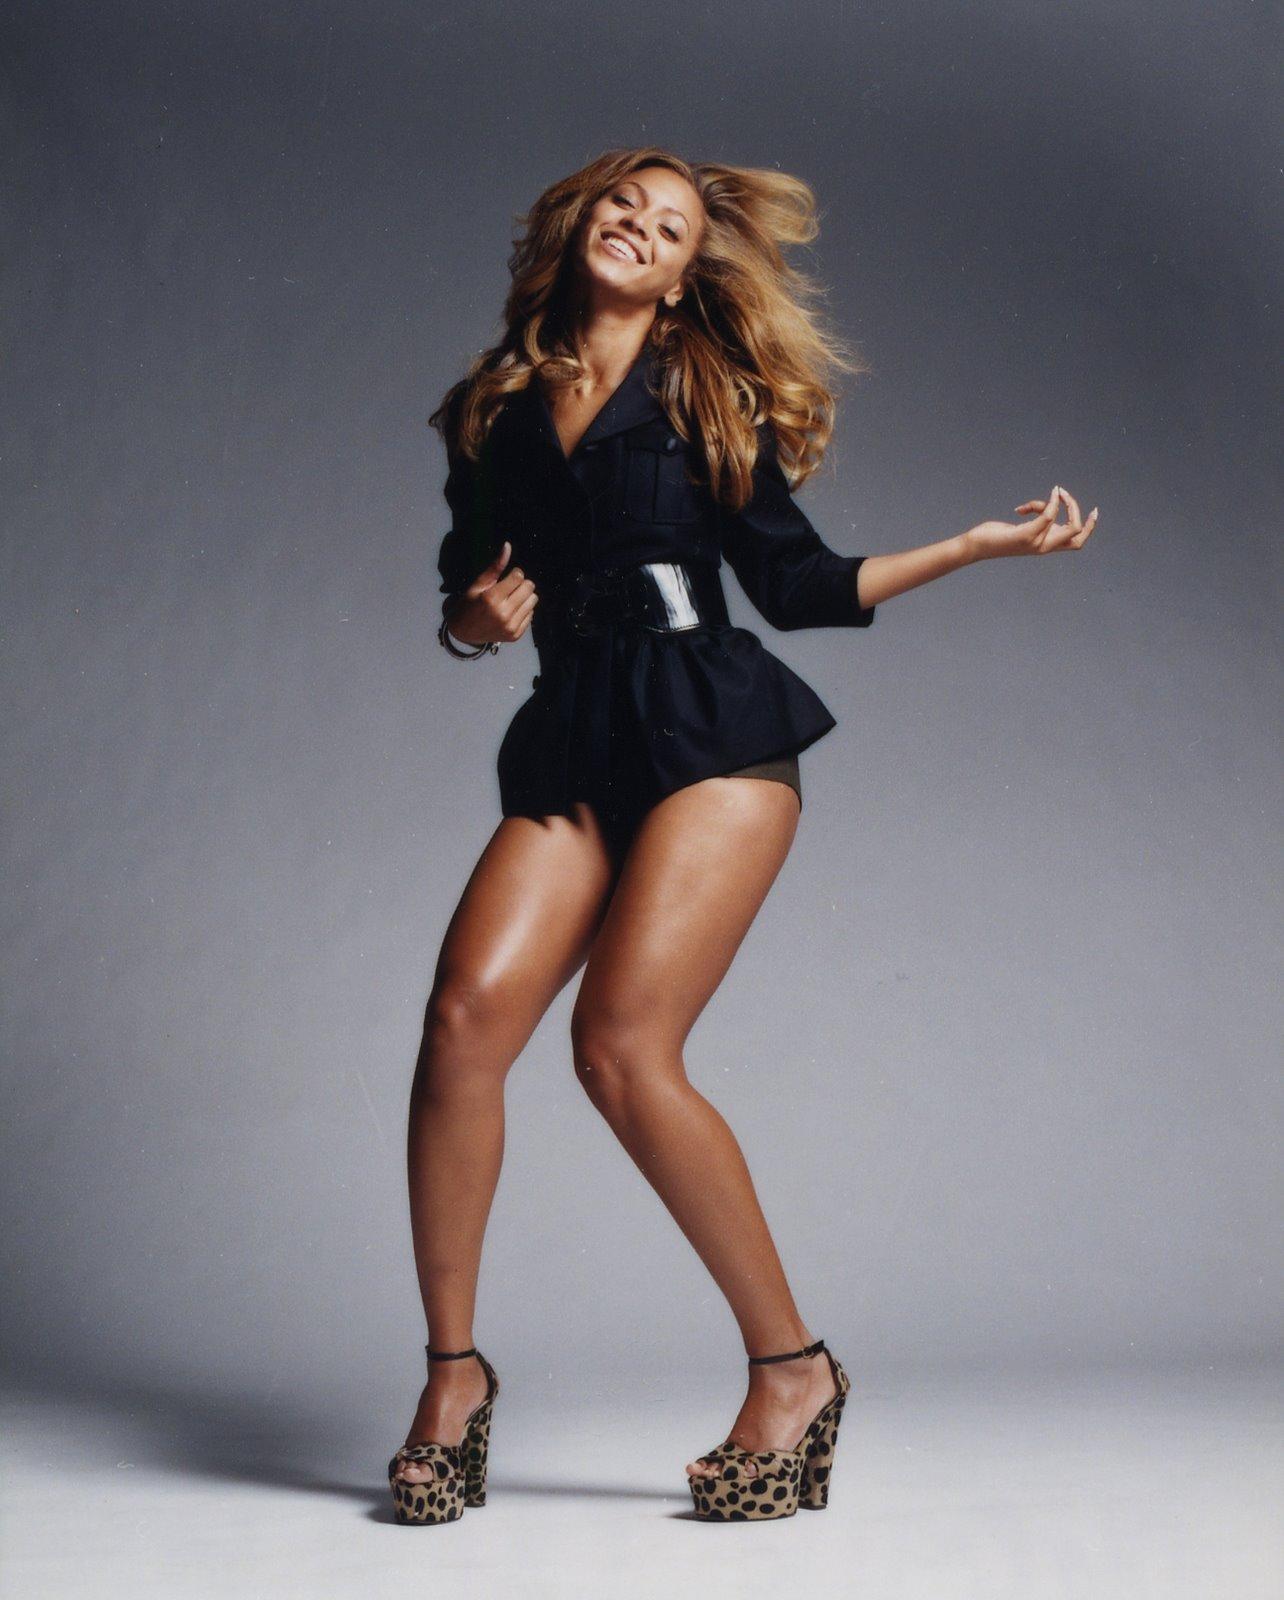 World Music | All Music | Any Music: Beyonce